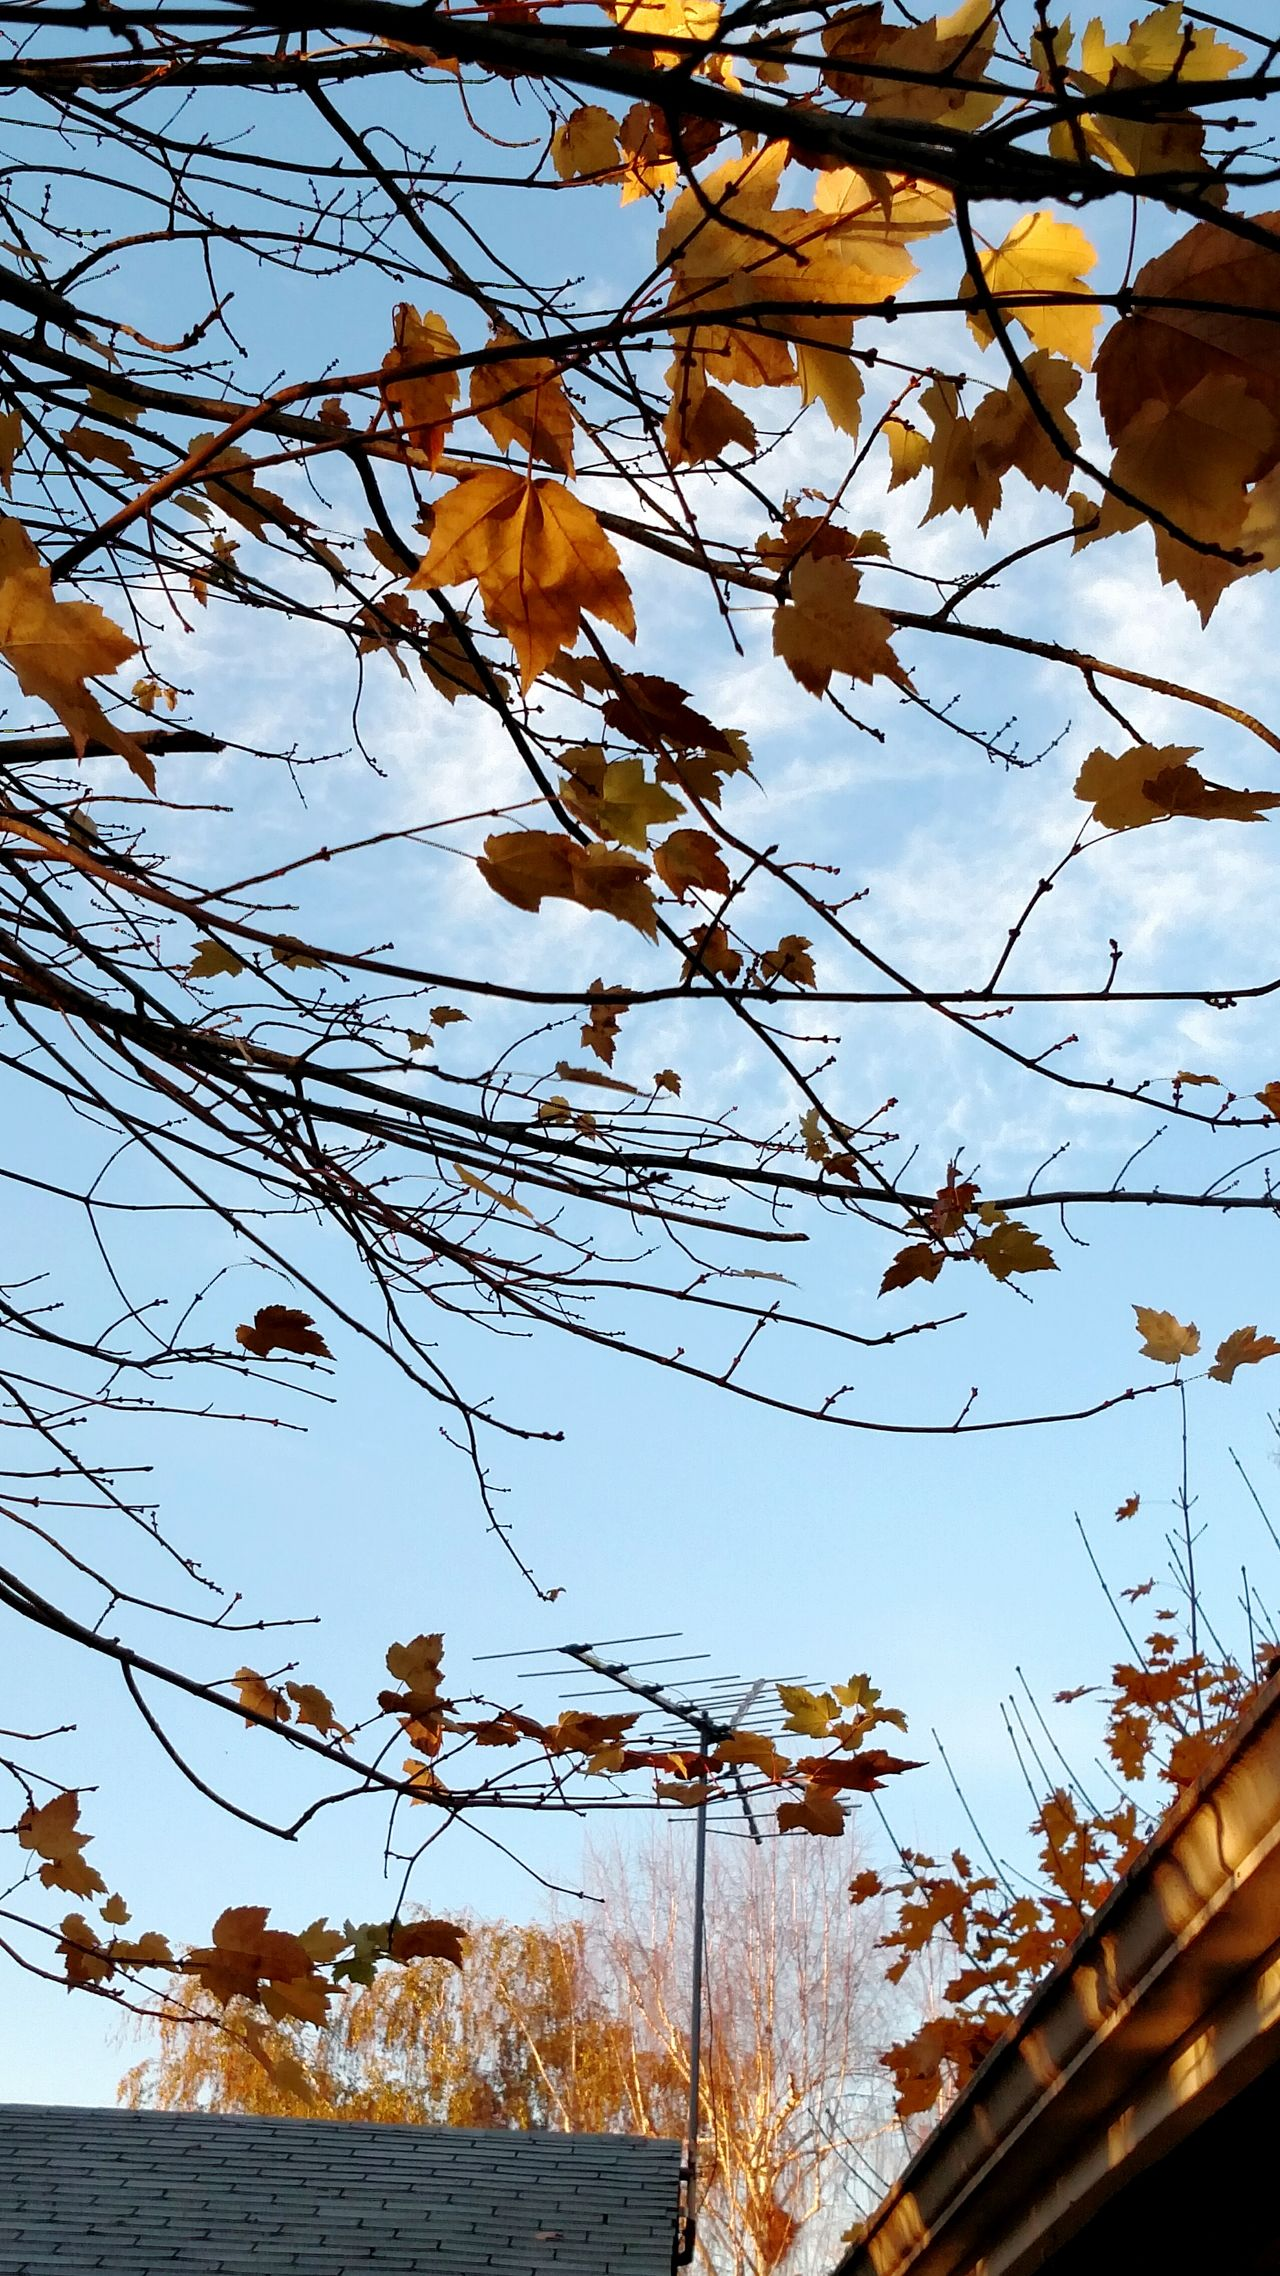 Clear Blue Sky Mapleleaf Leafs Tree Rooftop Beautiful Fall Day